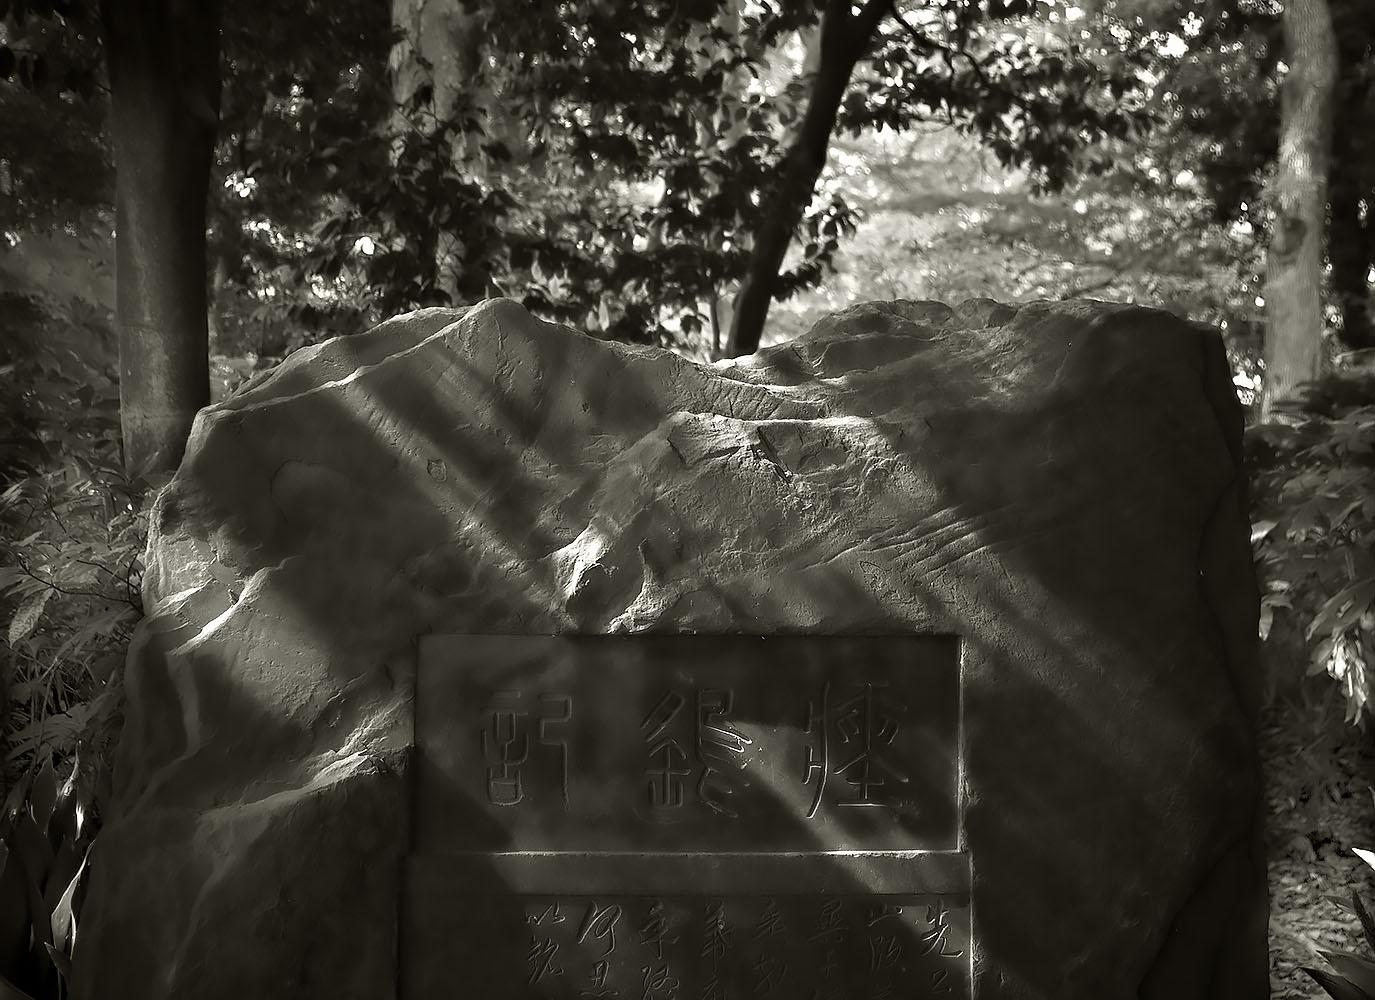 Japanese Garden Project #10